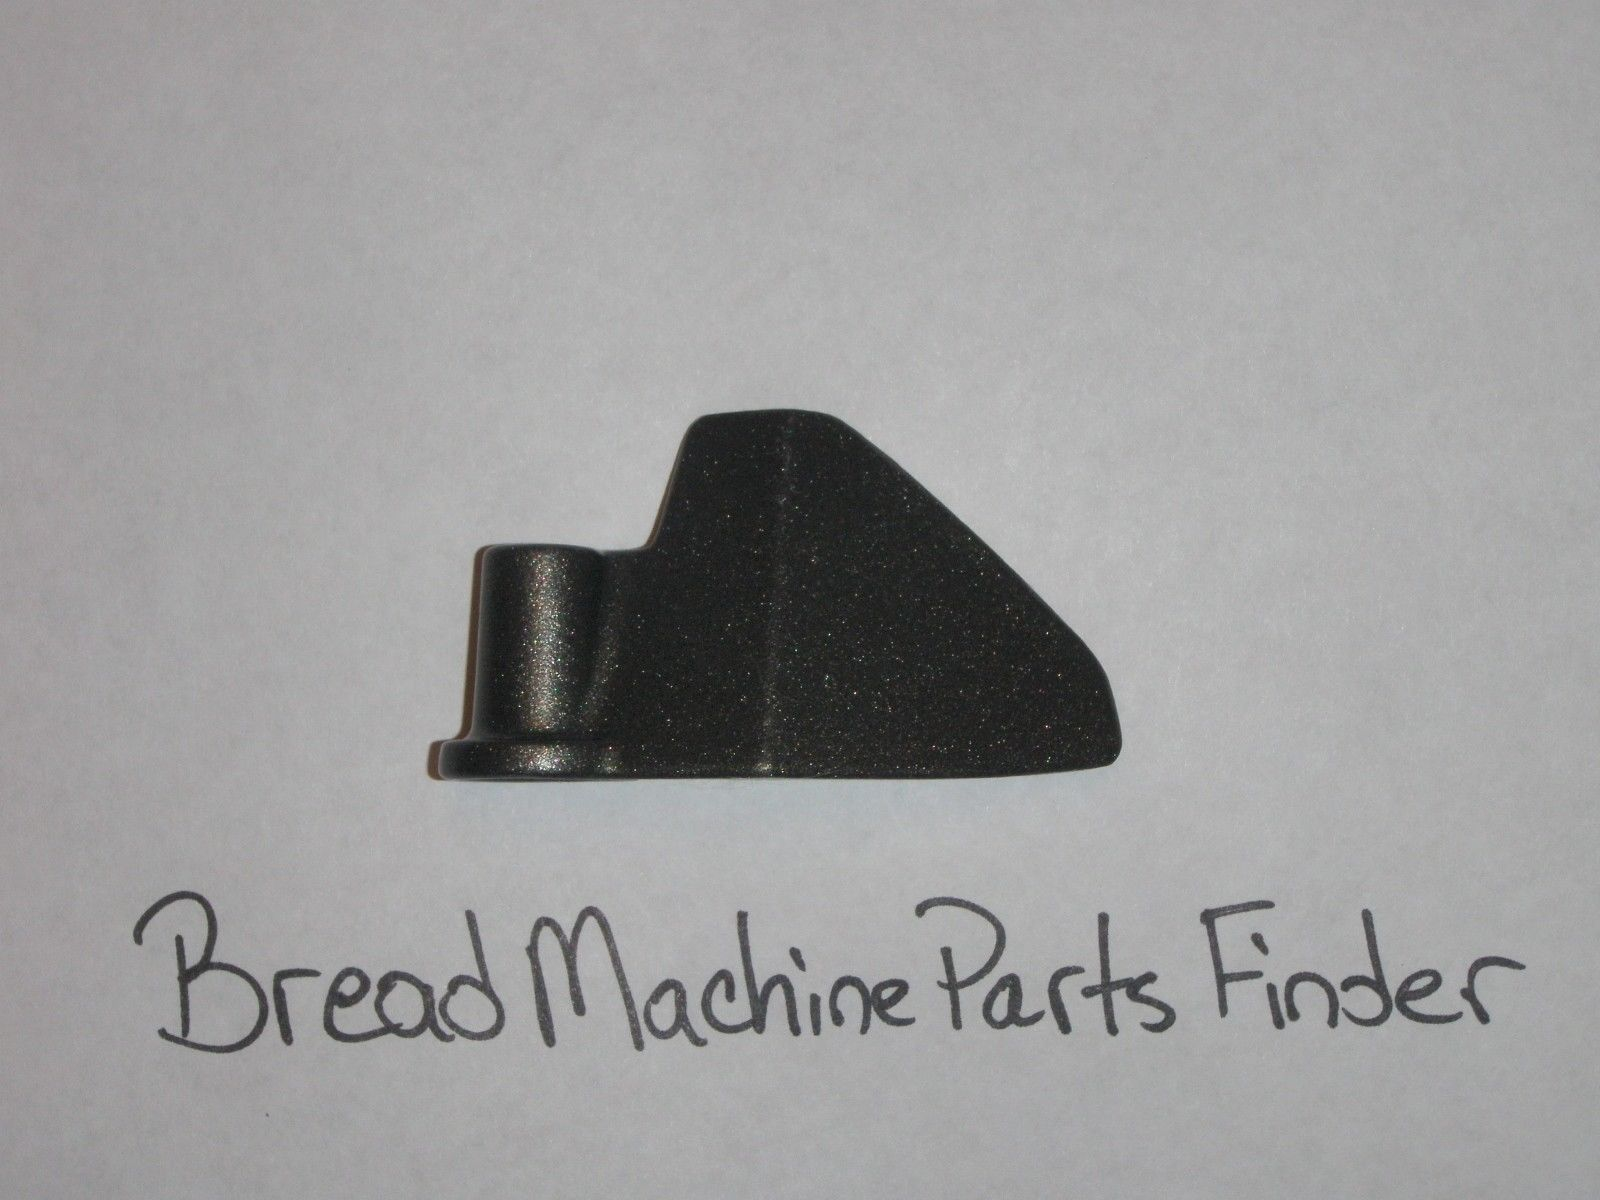 Kenmore Automatic Bread Maker